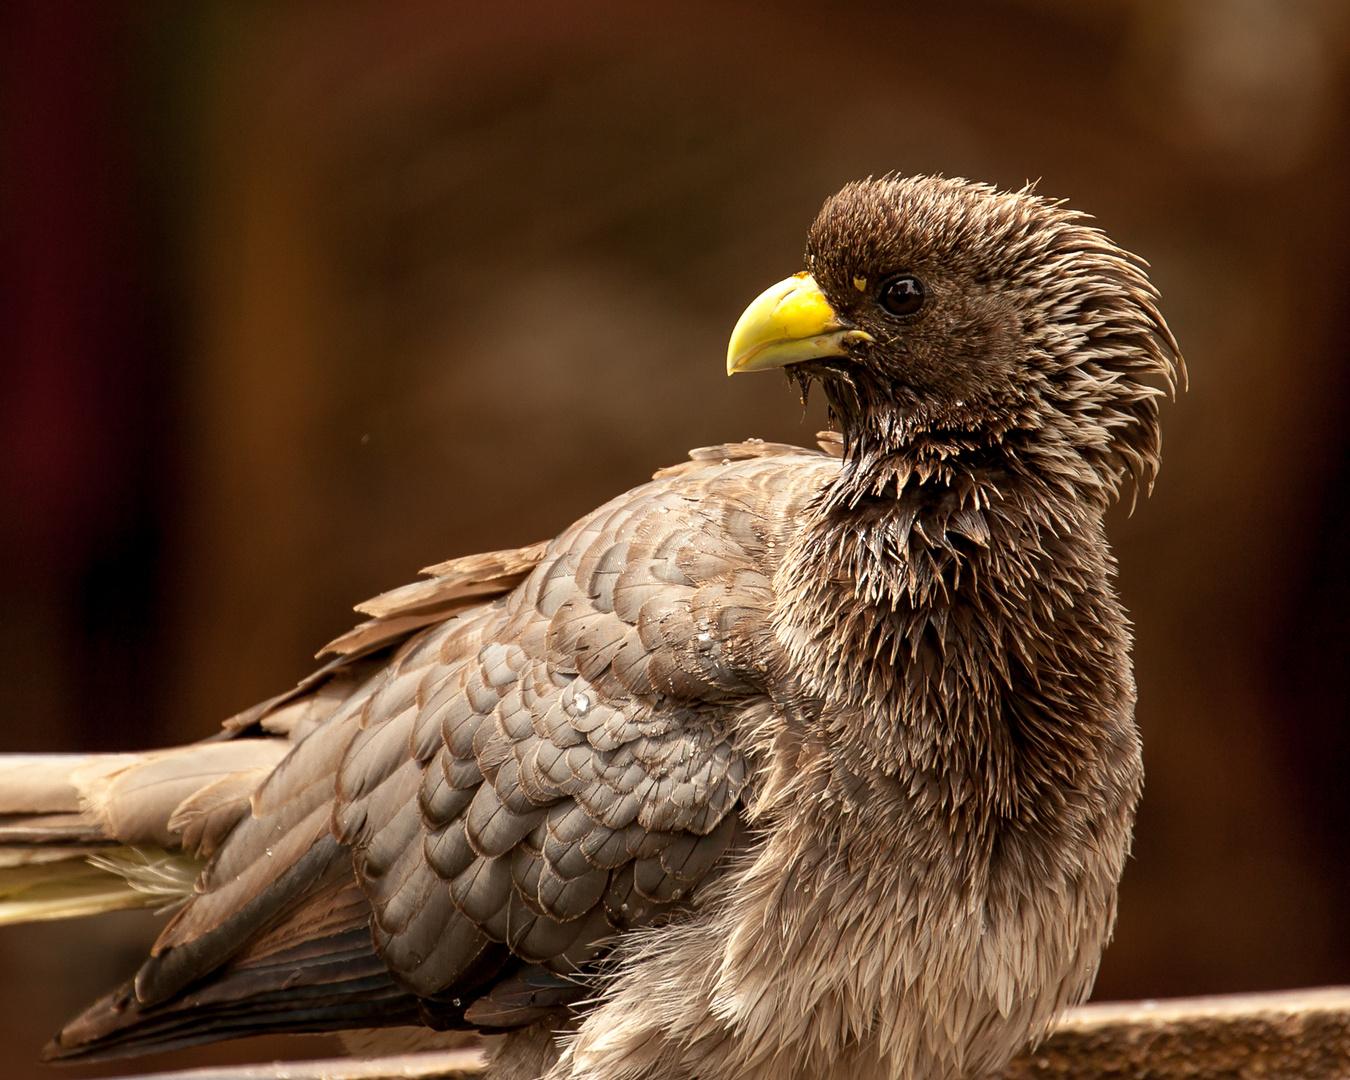 Spassvogel